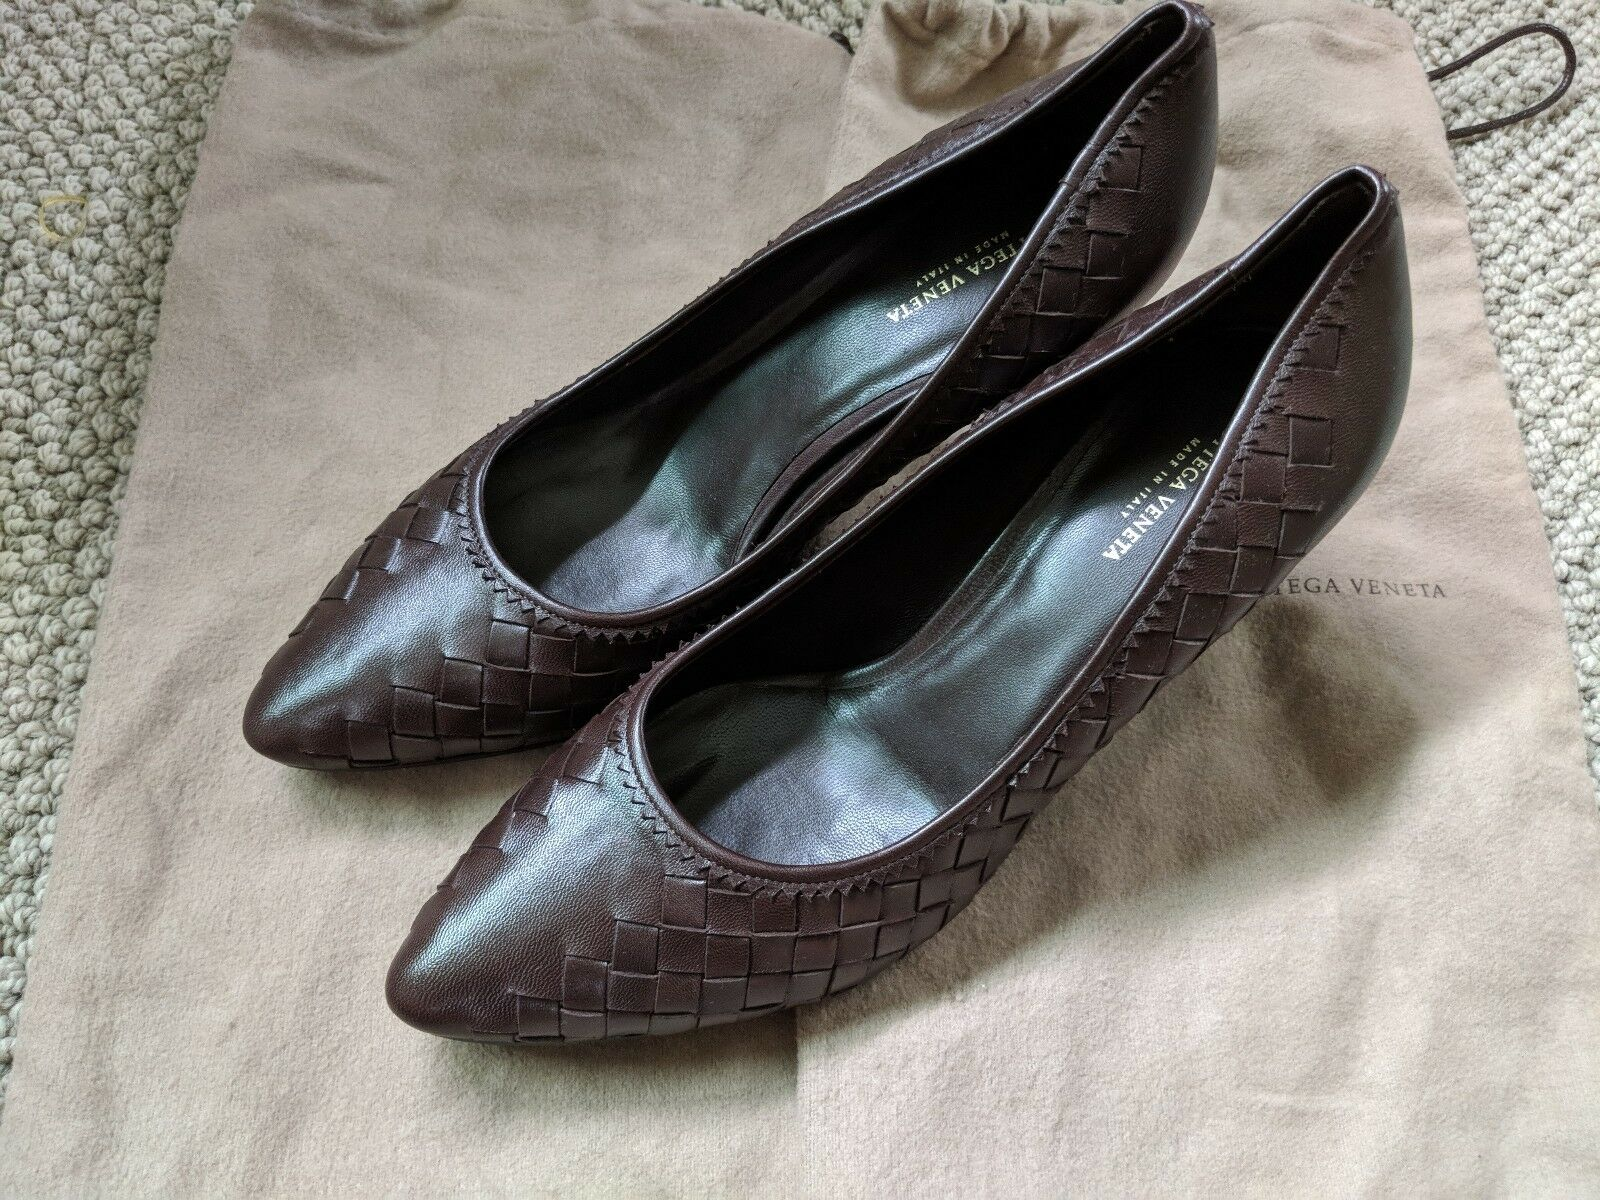 Classic Bottega Veneta Pointed Pointed Pointed Toe Heels 77f23c